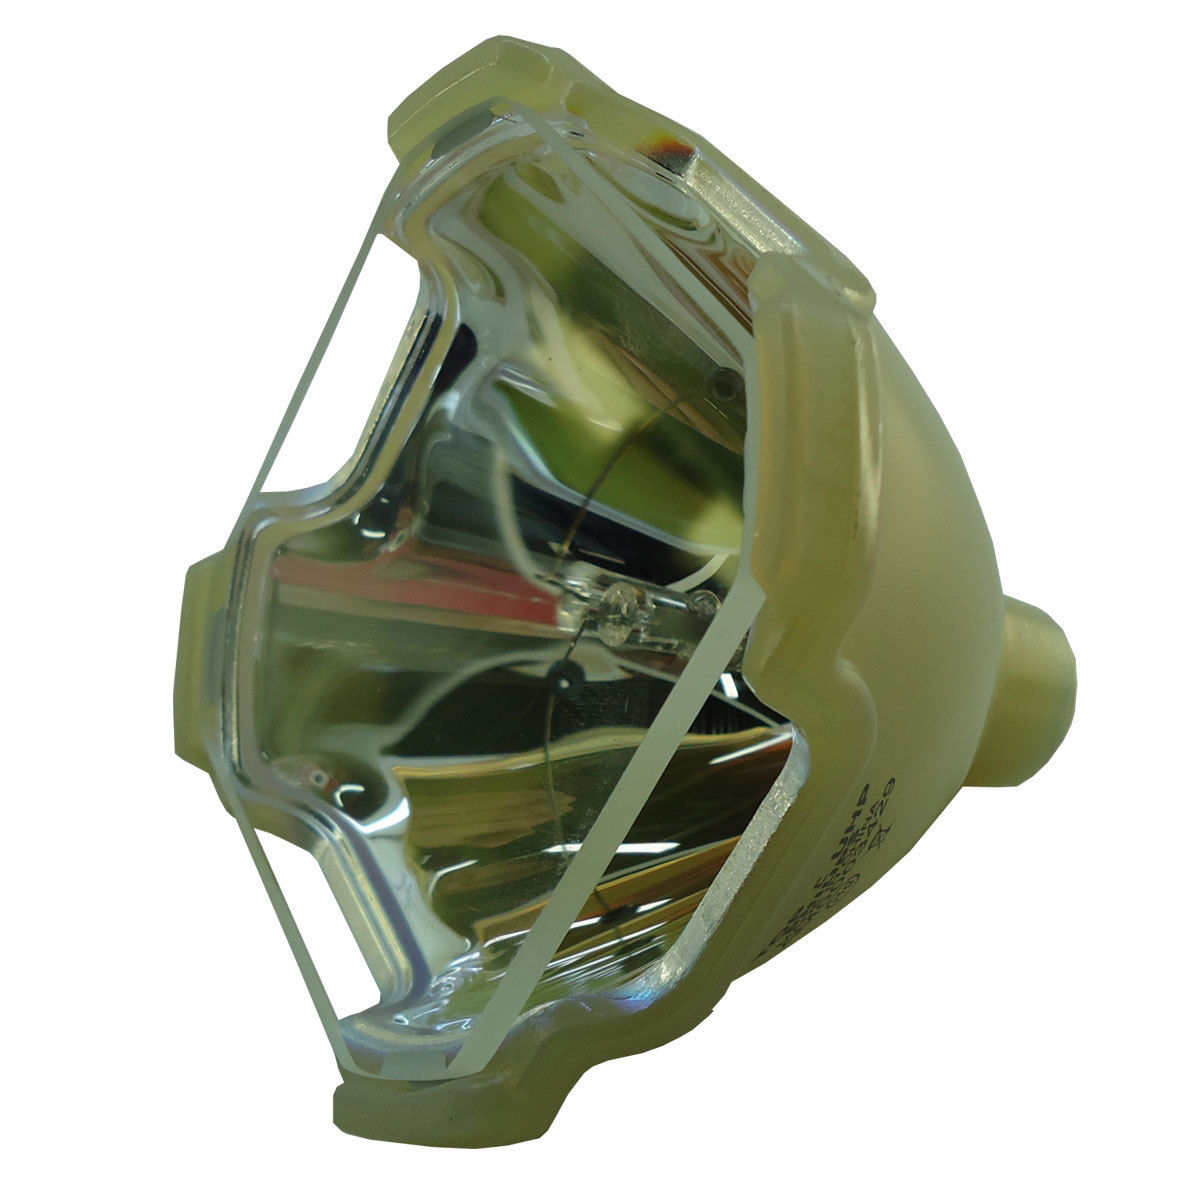 Compatible Bare Bulb POA-LMP81 LMP81 610-3149127 for SANYO PLC-XP51 PLC-XP56 PLC-XP51L PLC-XP56L PLC-XP5100C Projector Lamp Bulb 610 349 7518 poa lmp142 original bare lamp for sanyo plc wk2500 plc xd2600 xd2200 plc xe34 plc xk2200 plc xk2600 plc xk3010